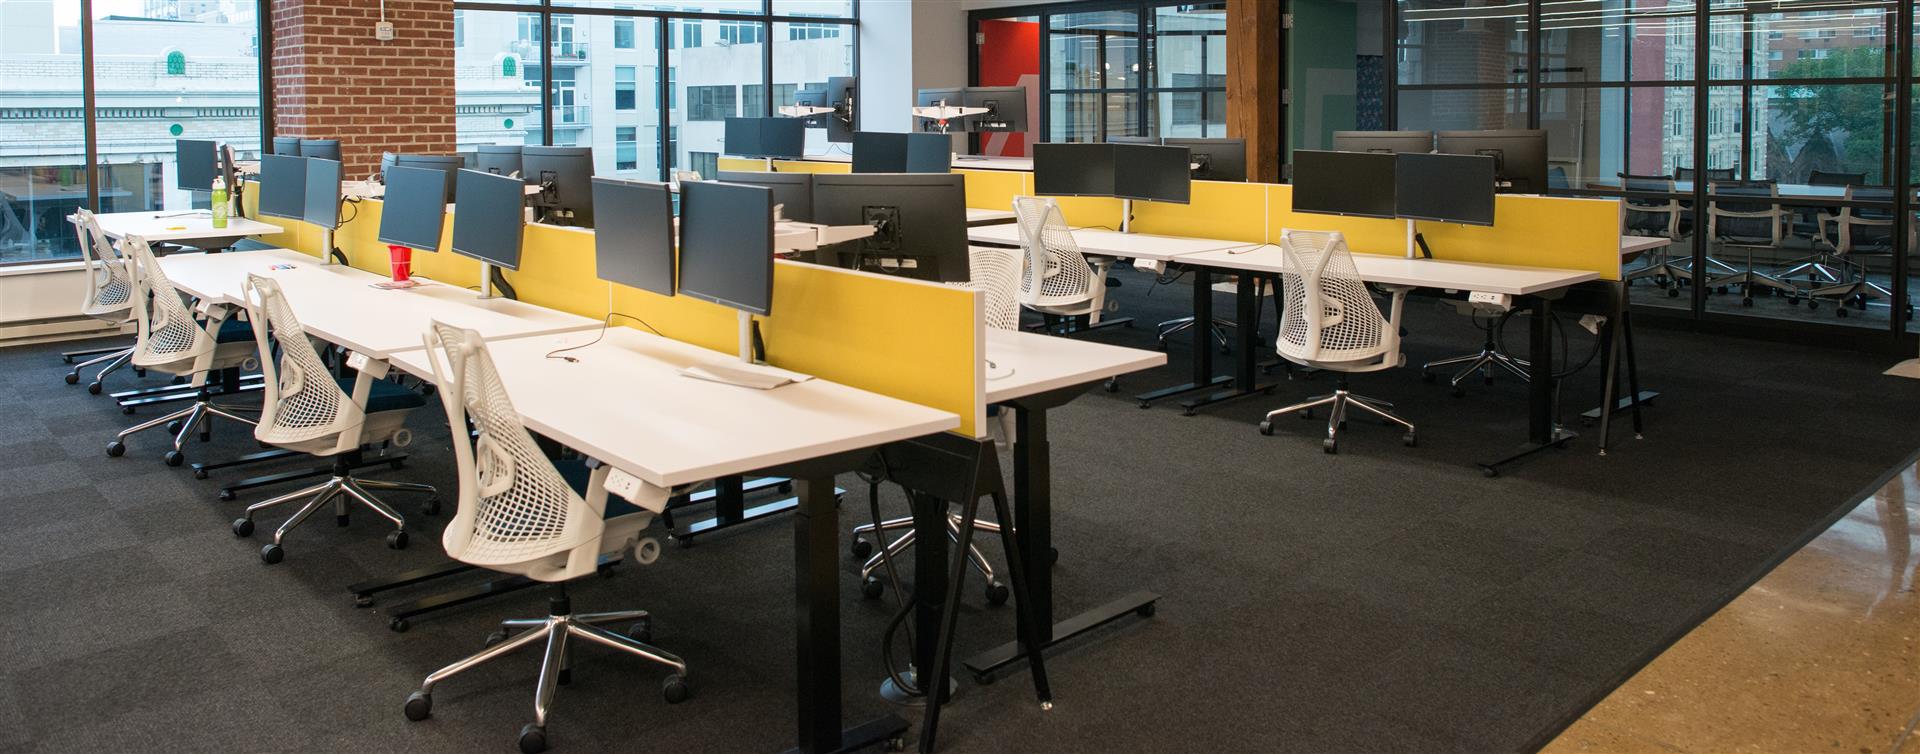 Bristol Office Furniture - Gazelle Office Furniture